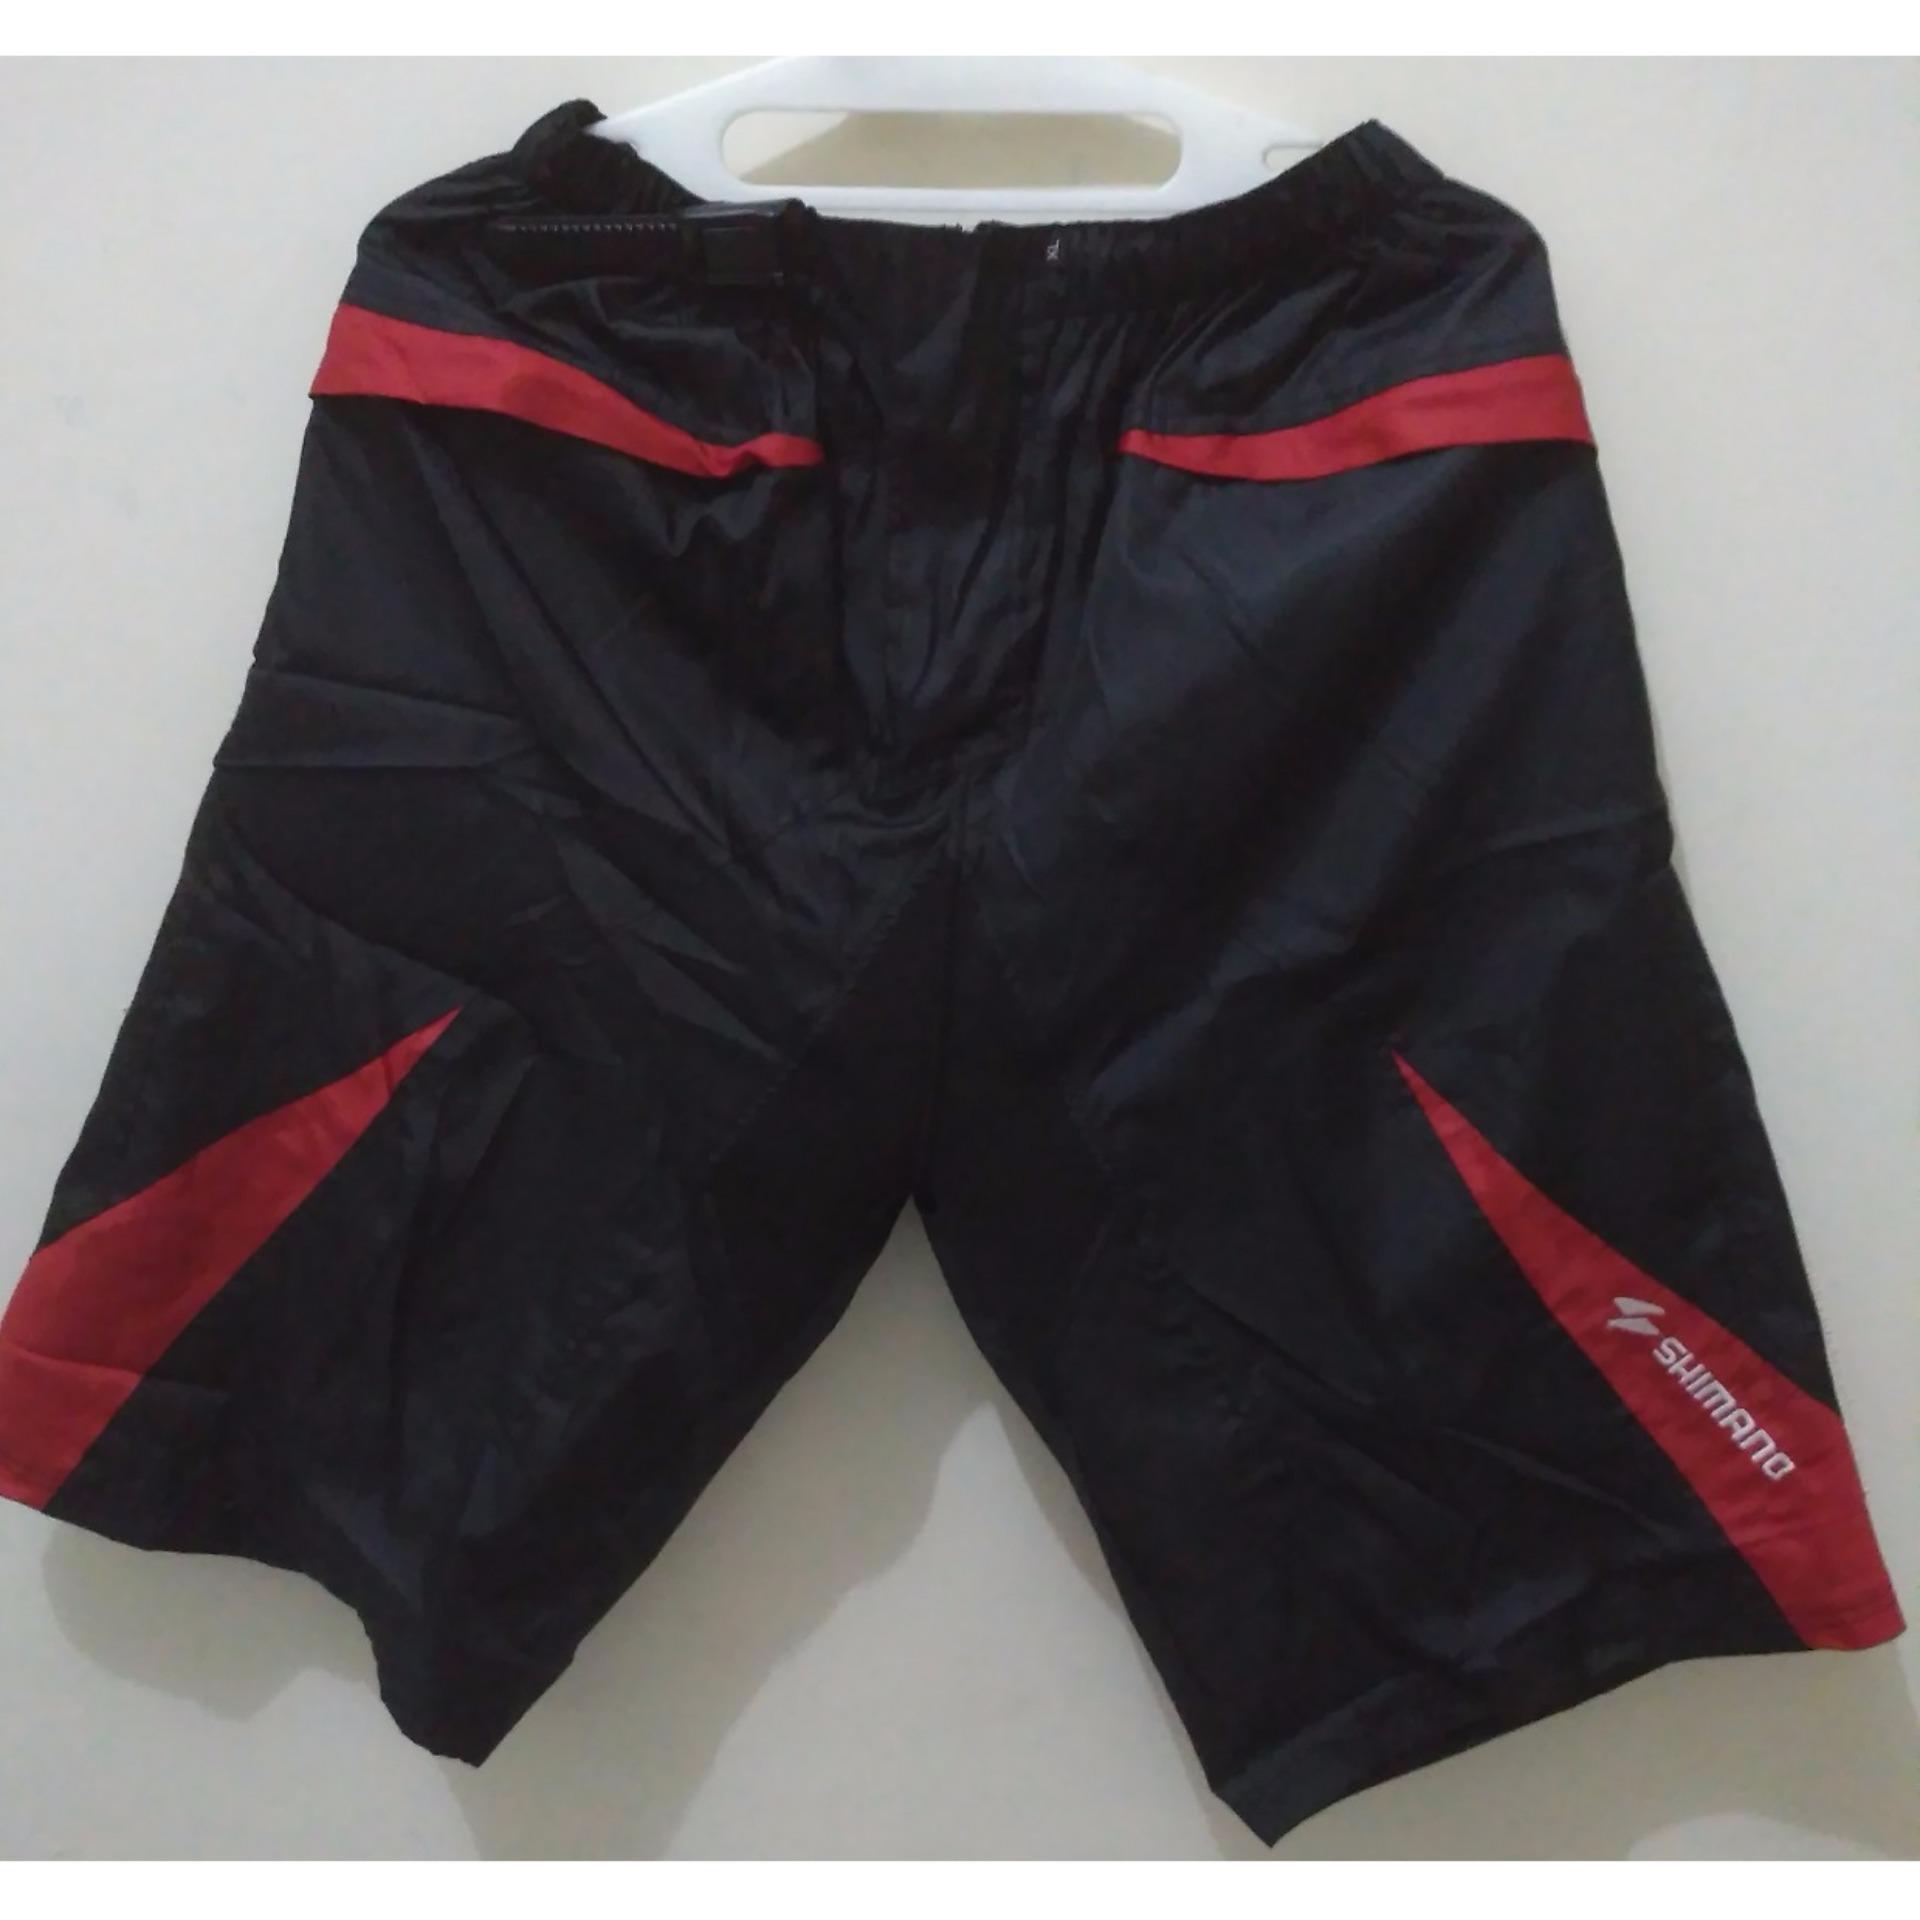 Daftar Harga Celana Sepeda Padding Tidak Ketat Shimano Specialized Jeans Pria Longgar Lurus 868 Biru Obral